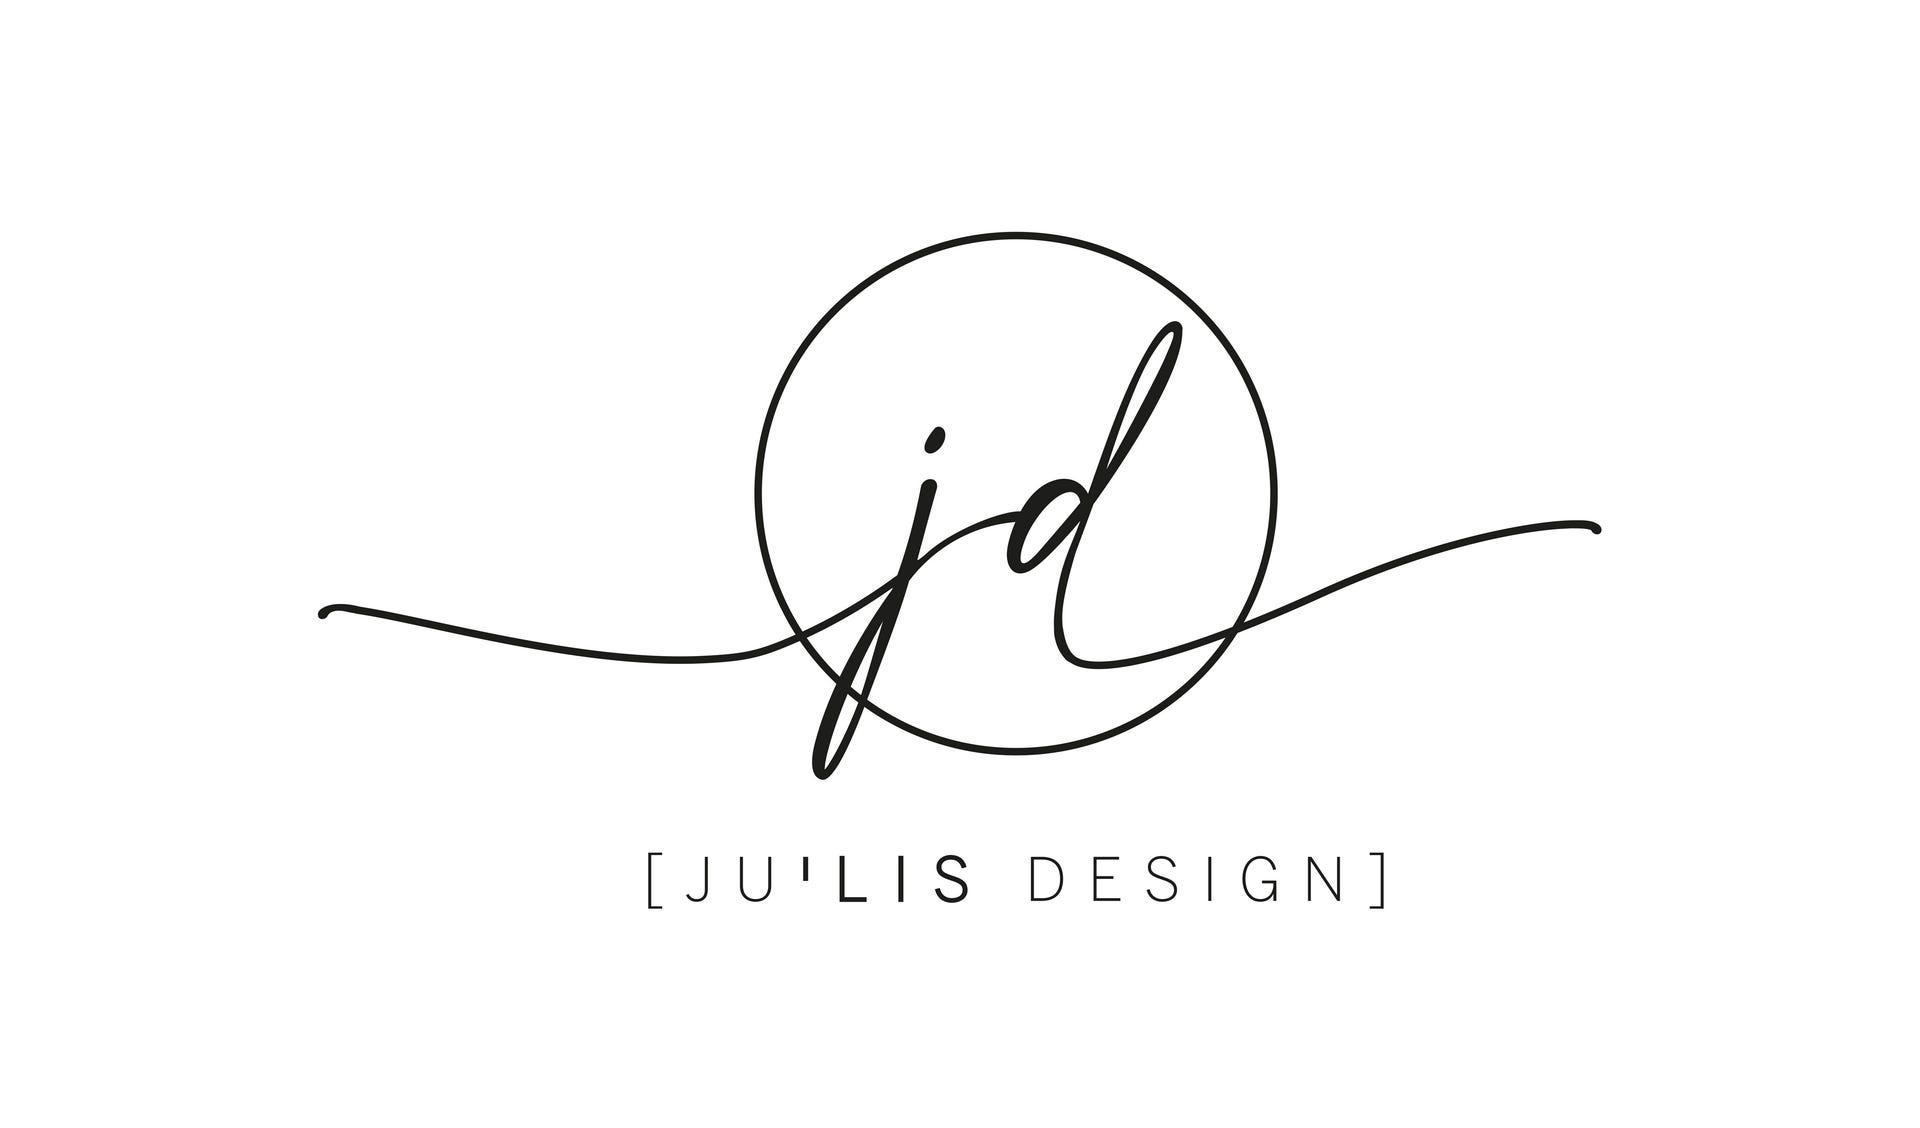 Julis Design